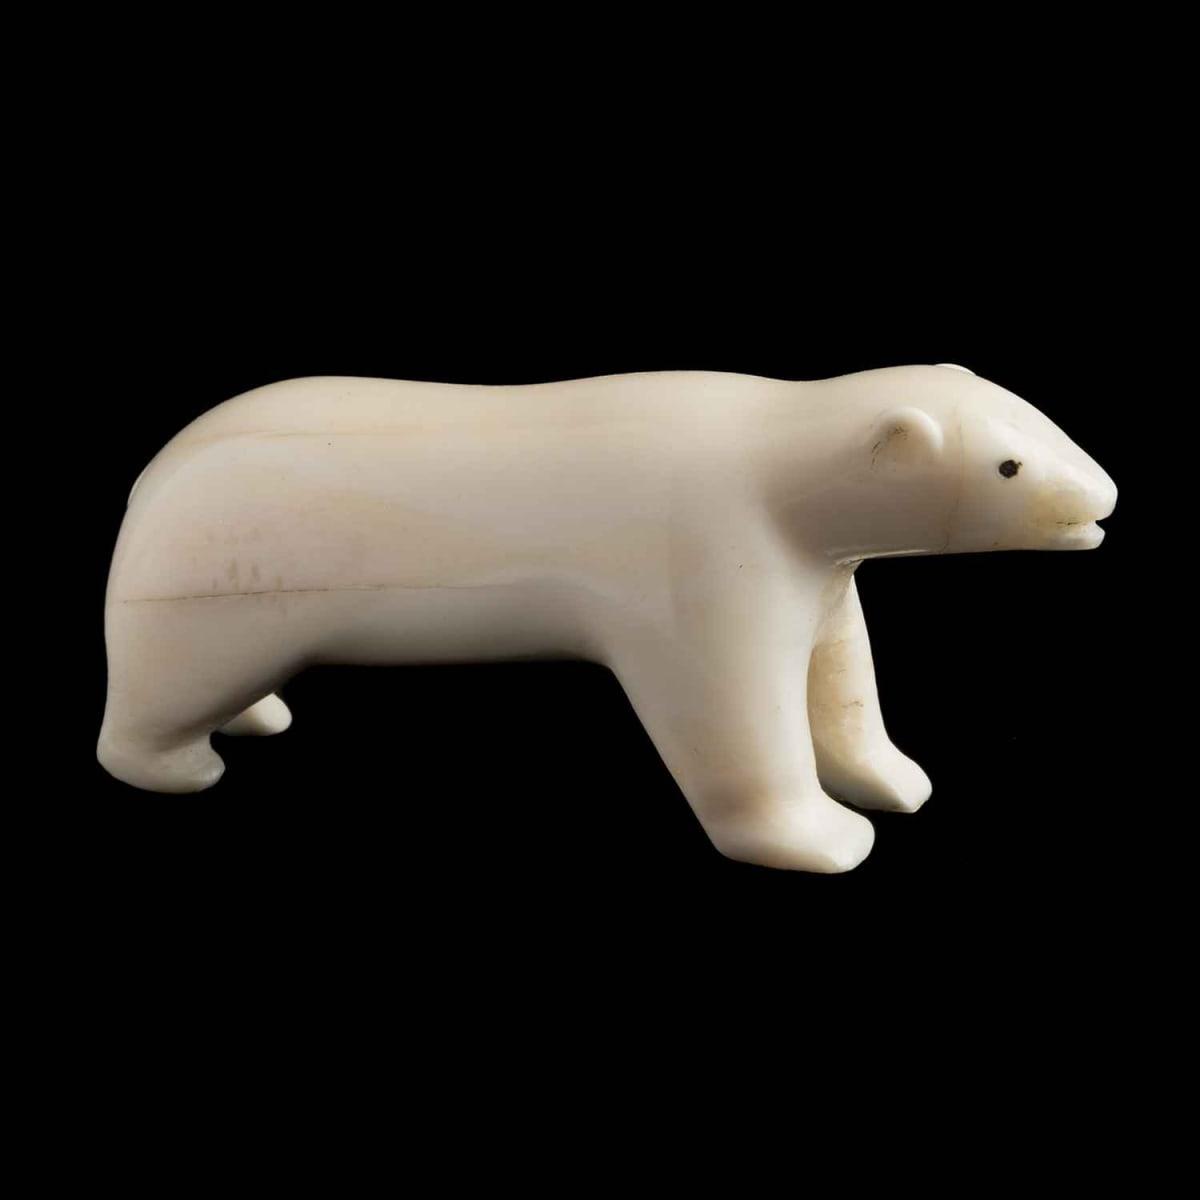 55. UNIDENTIFIED ARTIST, KUGAARUK (PELLY BAY) Polar Bear, 1968